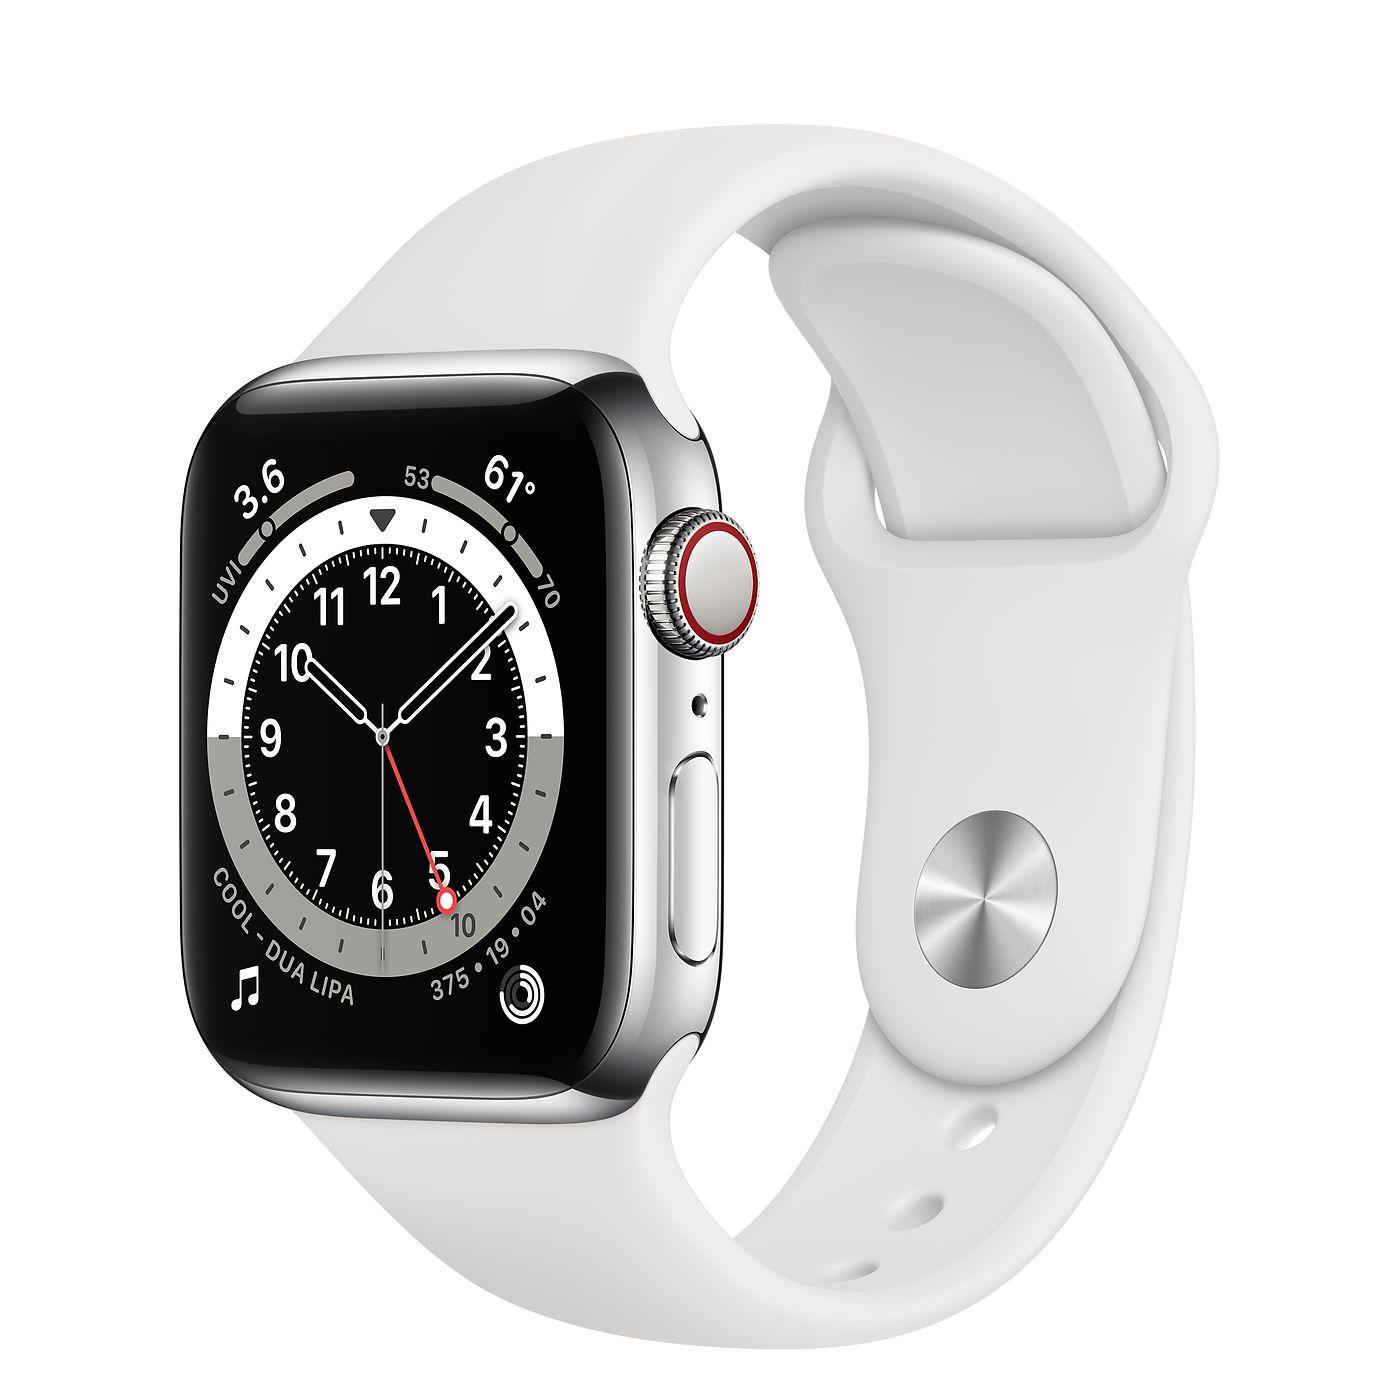 Apple 2020년 애플워치 6, GPS+Cellular, 실버 스테인리스 스틸 케이스, 화이트 스포츠 밴드